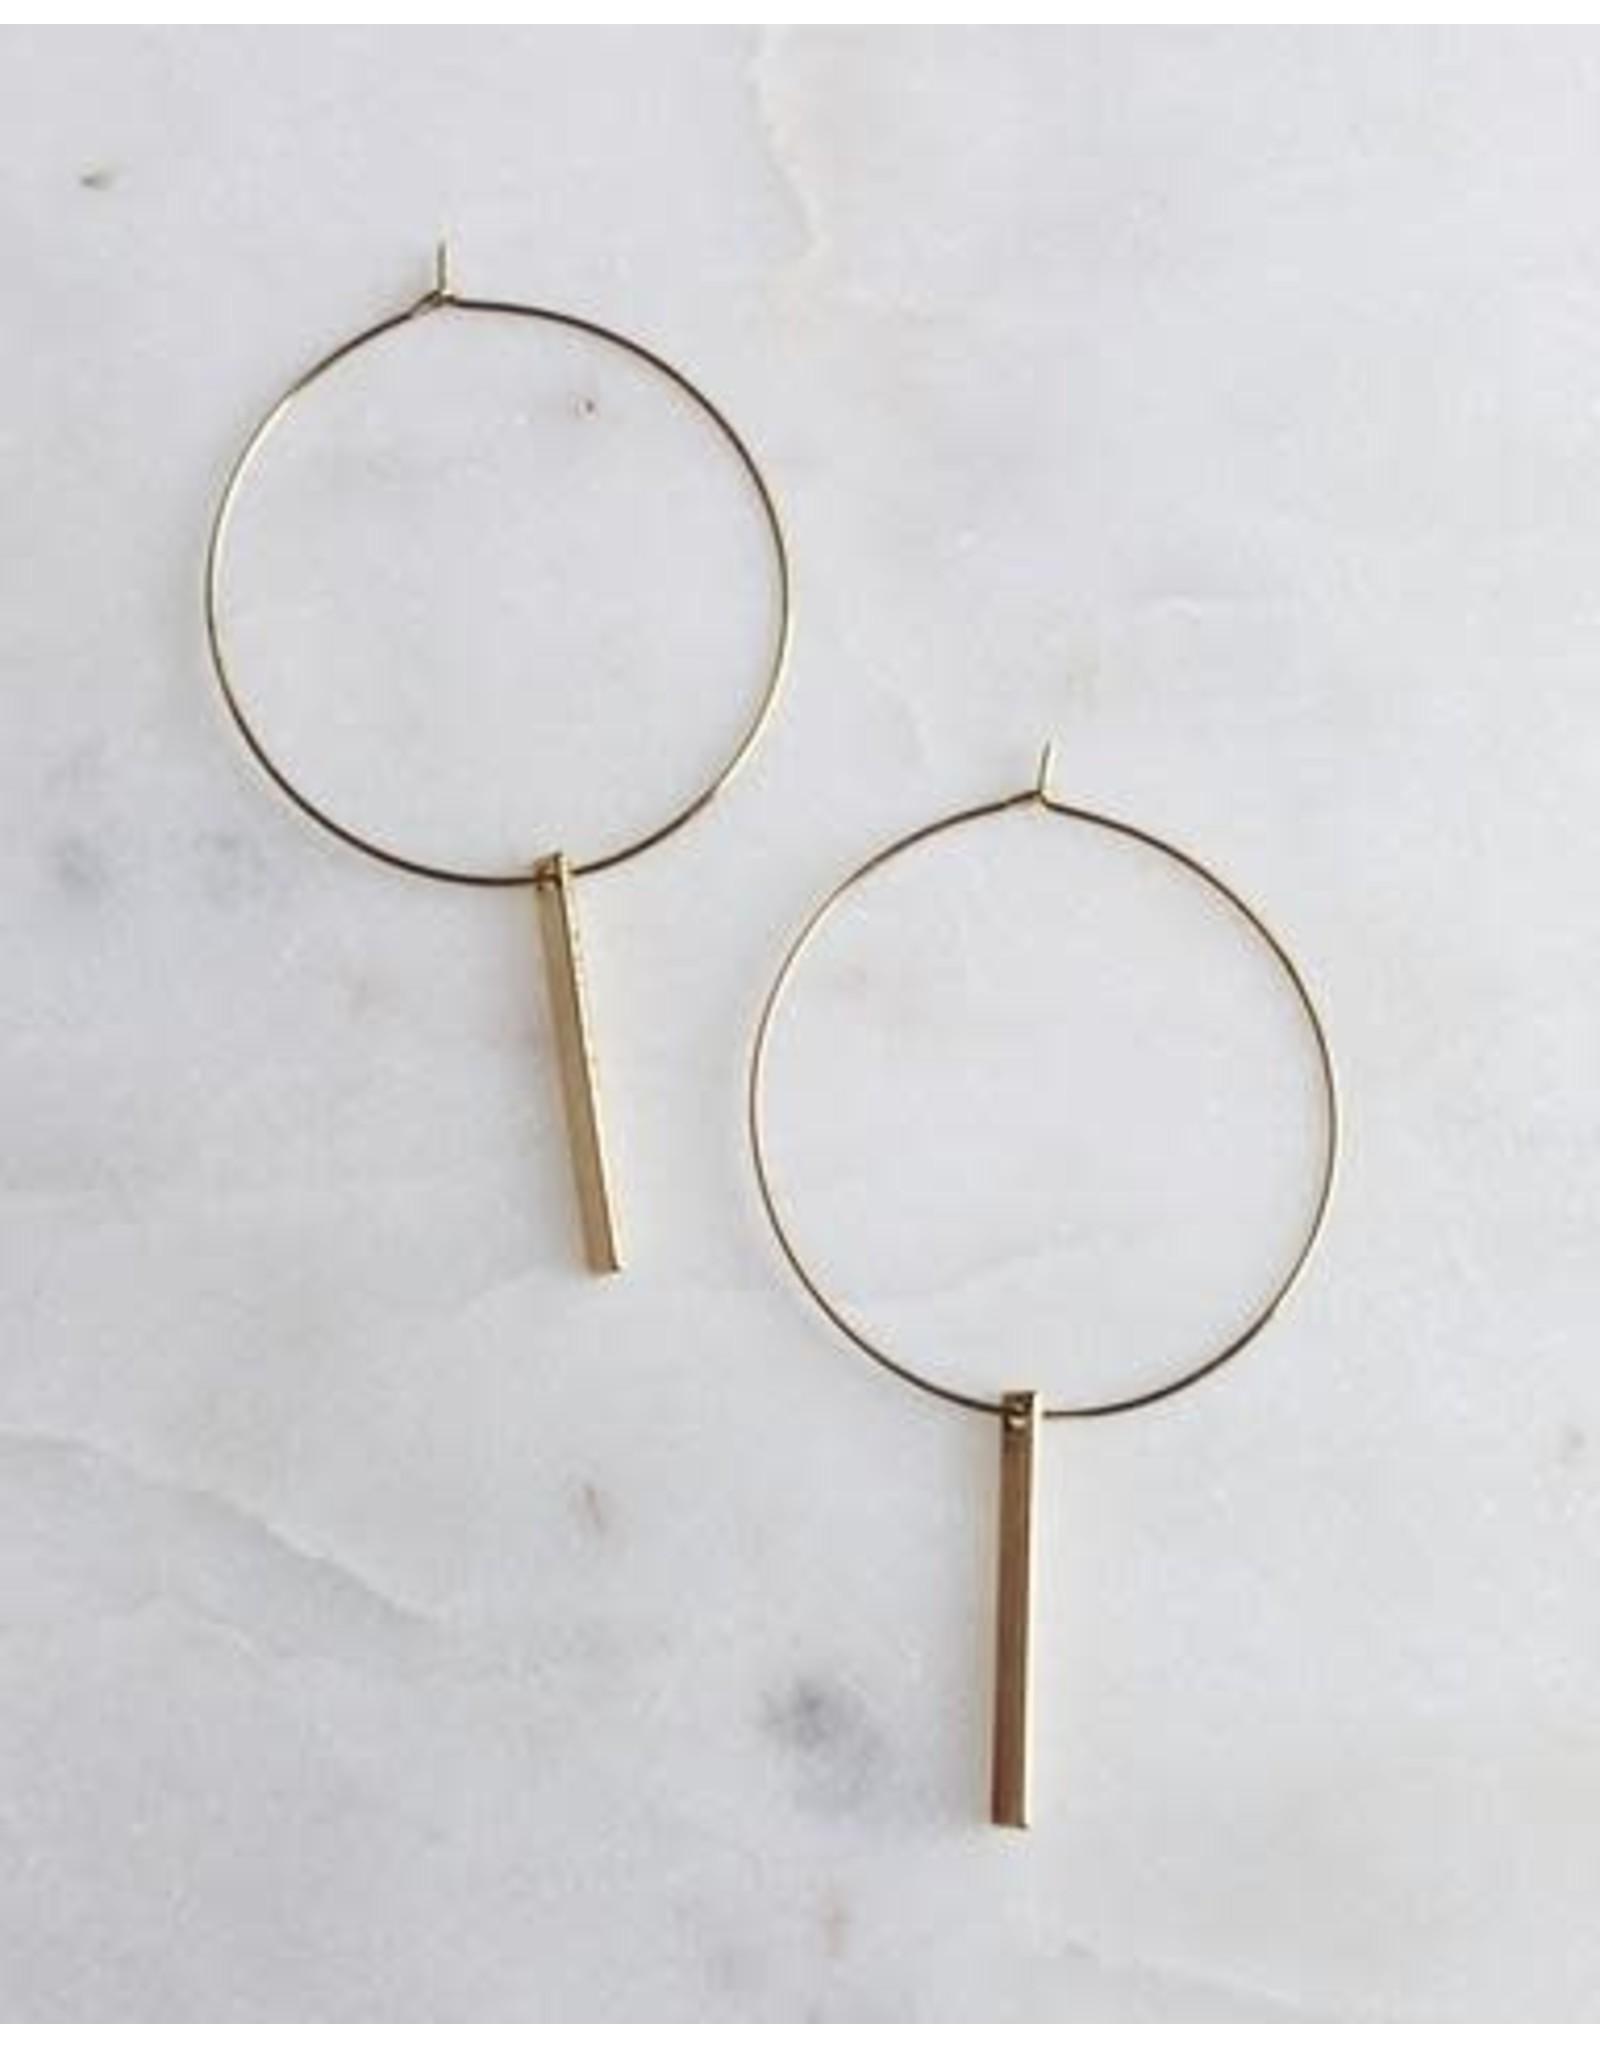 KINSEY DESIGNS HAZLEY WIRE HOOP WITH BAR EARRING